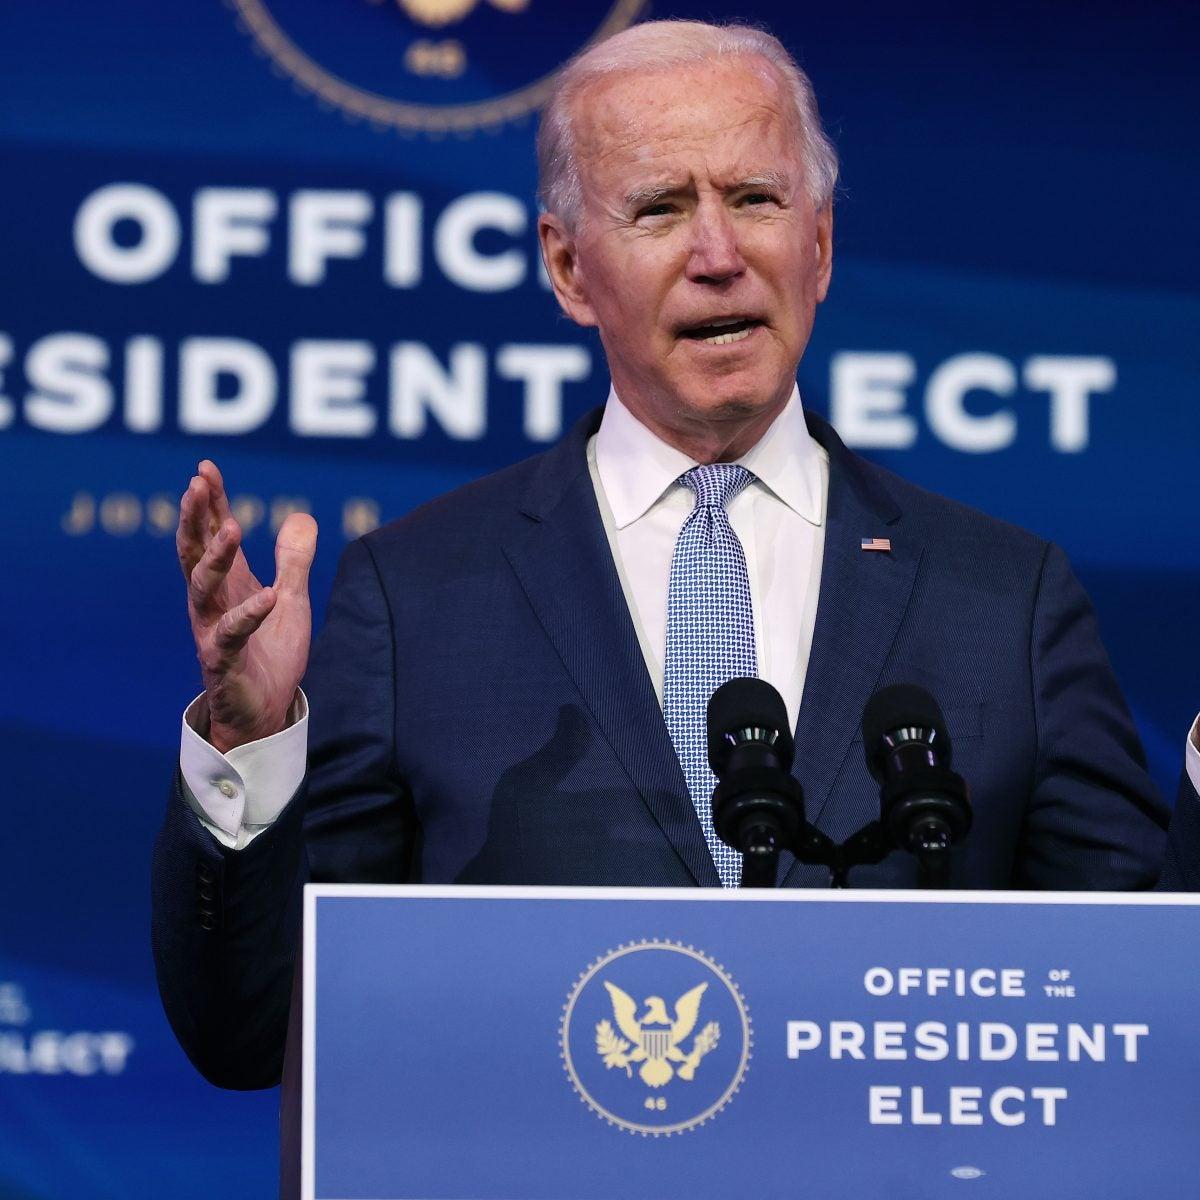 Congress Certifies Joe Biden As Winner Of Presidential Election